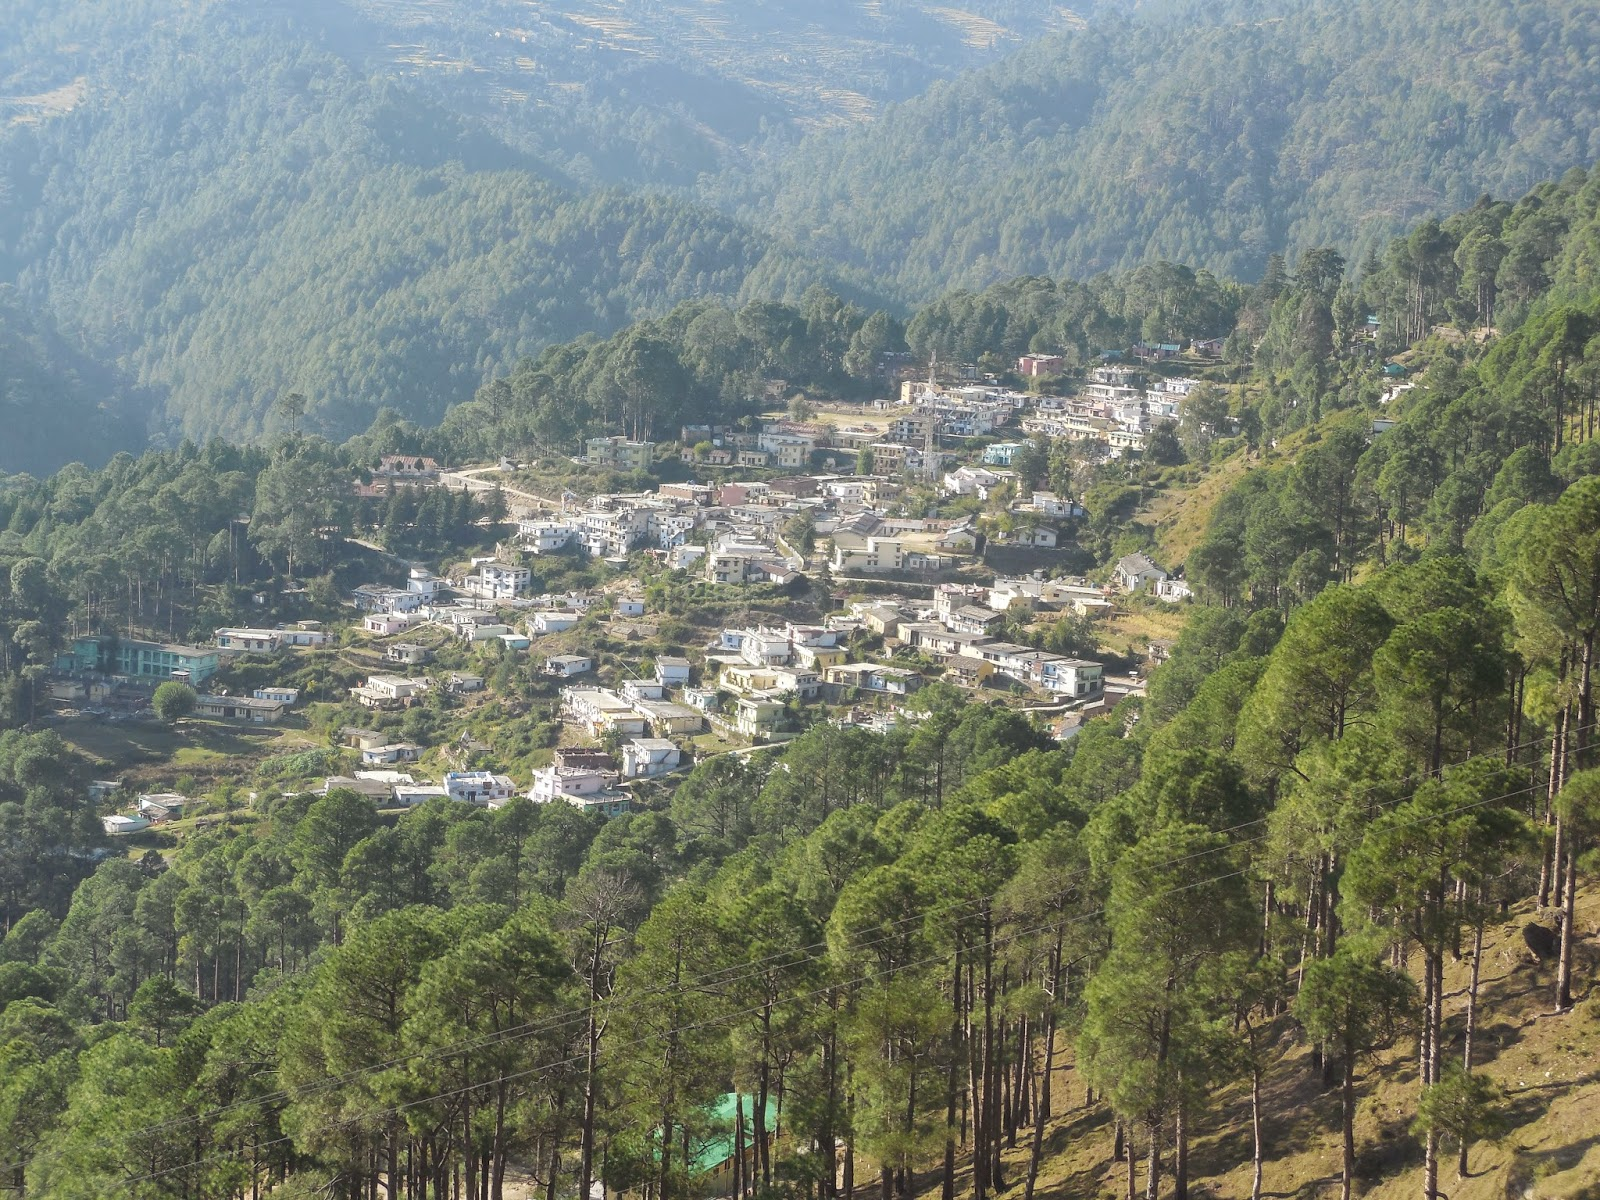 India Tourism : Thalisain, Pauri Garhwal, Uttarakhand